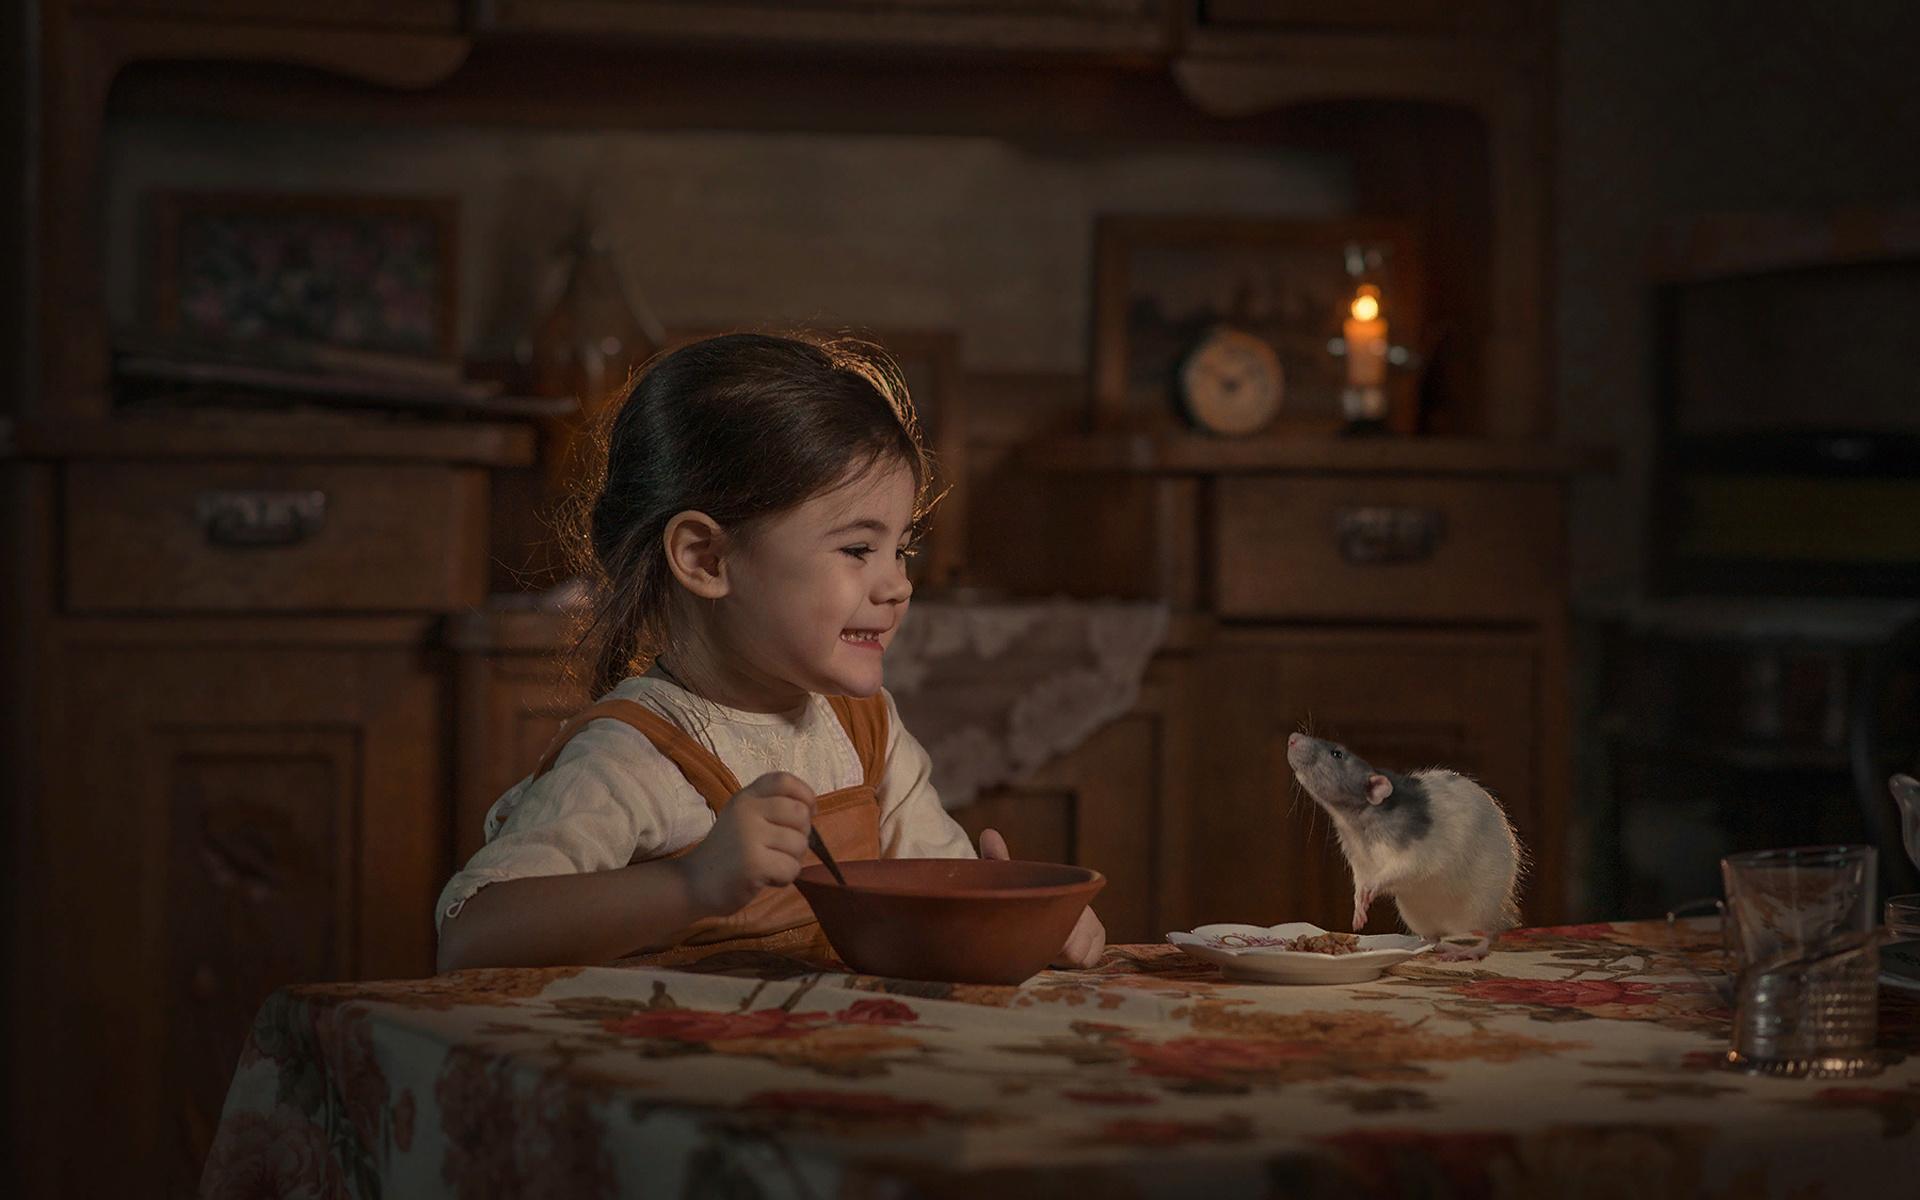 елена миронова, ребёнок, девочка, платье, косичка, животное, грызун, крыса, питомец, комната, стол, еда, тарелки